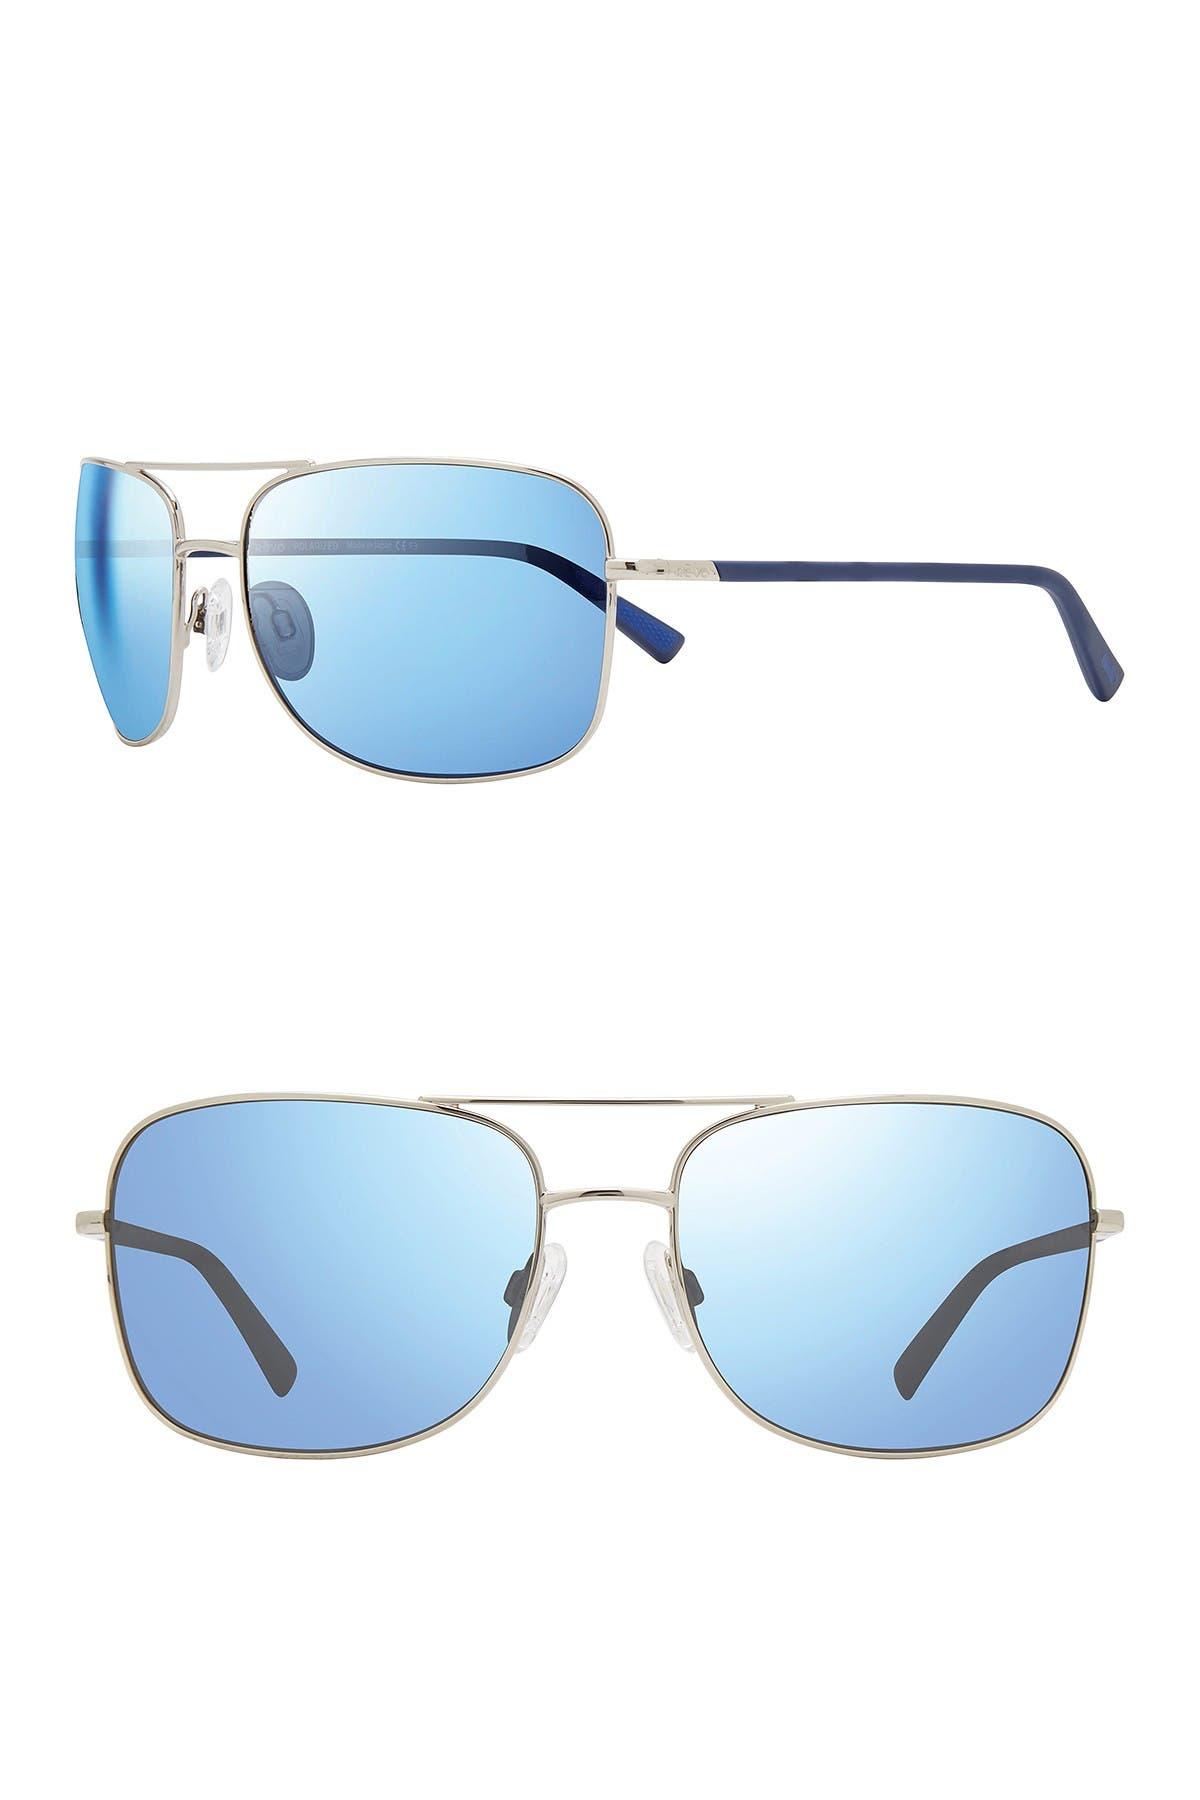 Revo Polarized Sunglasses Summit Navigator Frame